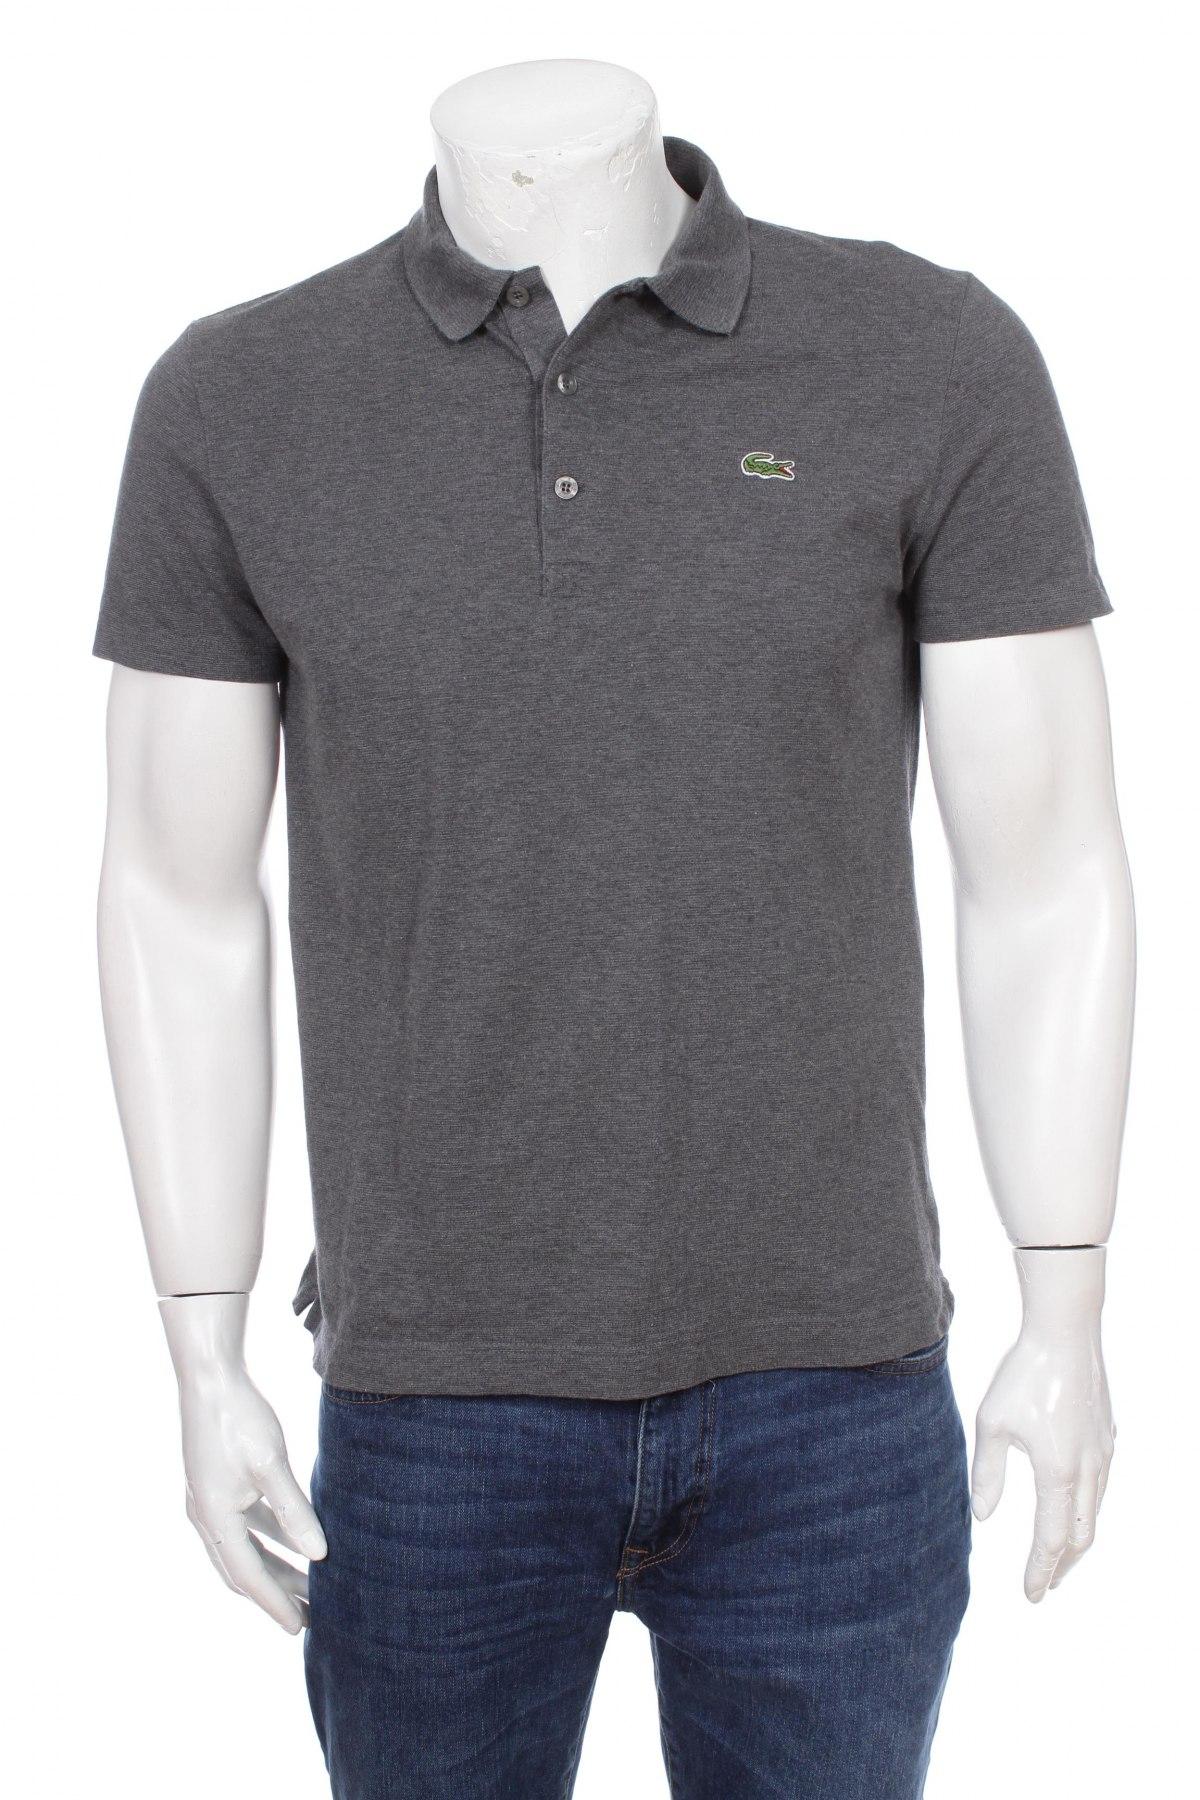 ea0bb210ad67 Ανδρικό t-shirt Lacoste - σε συμφέρουσα τιμή στο Remix -  103298073